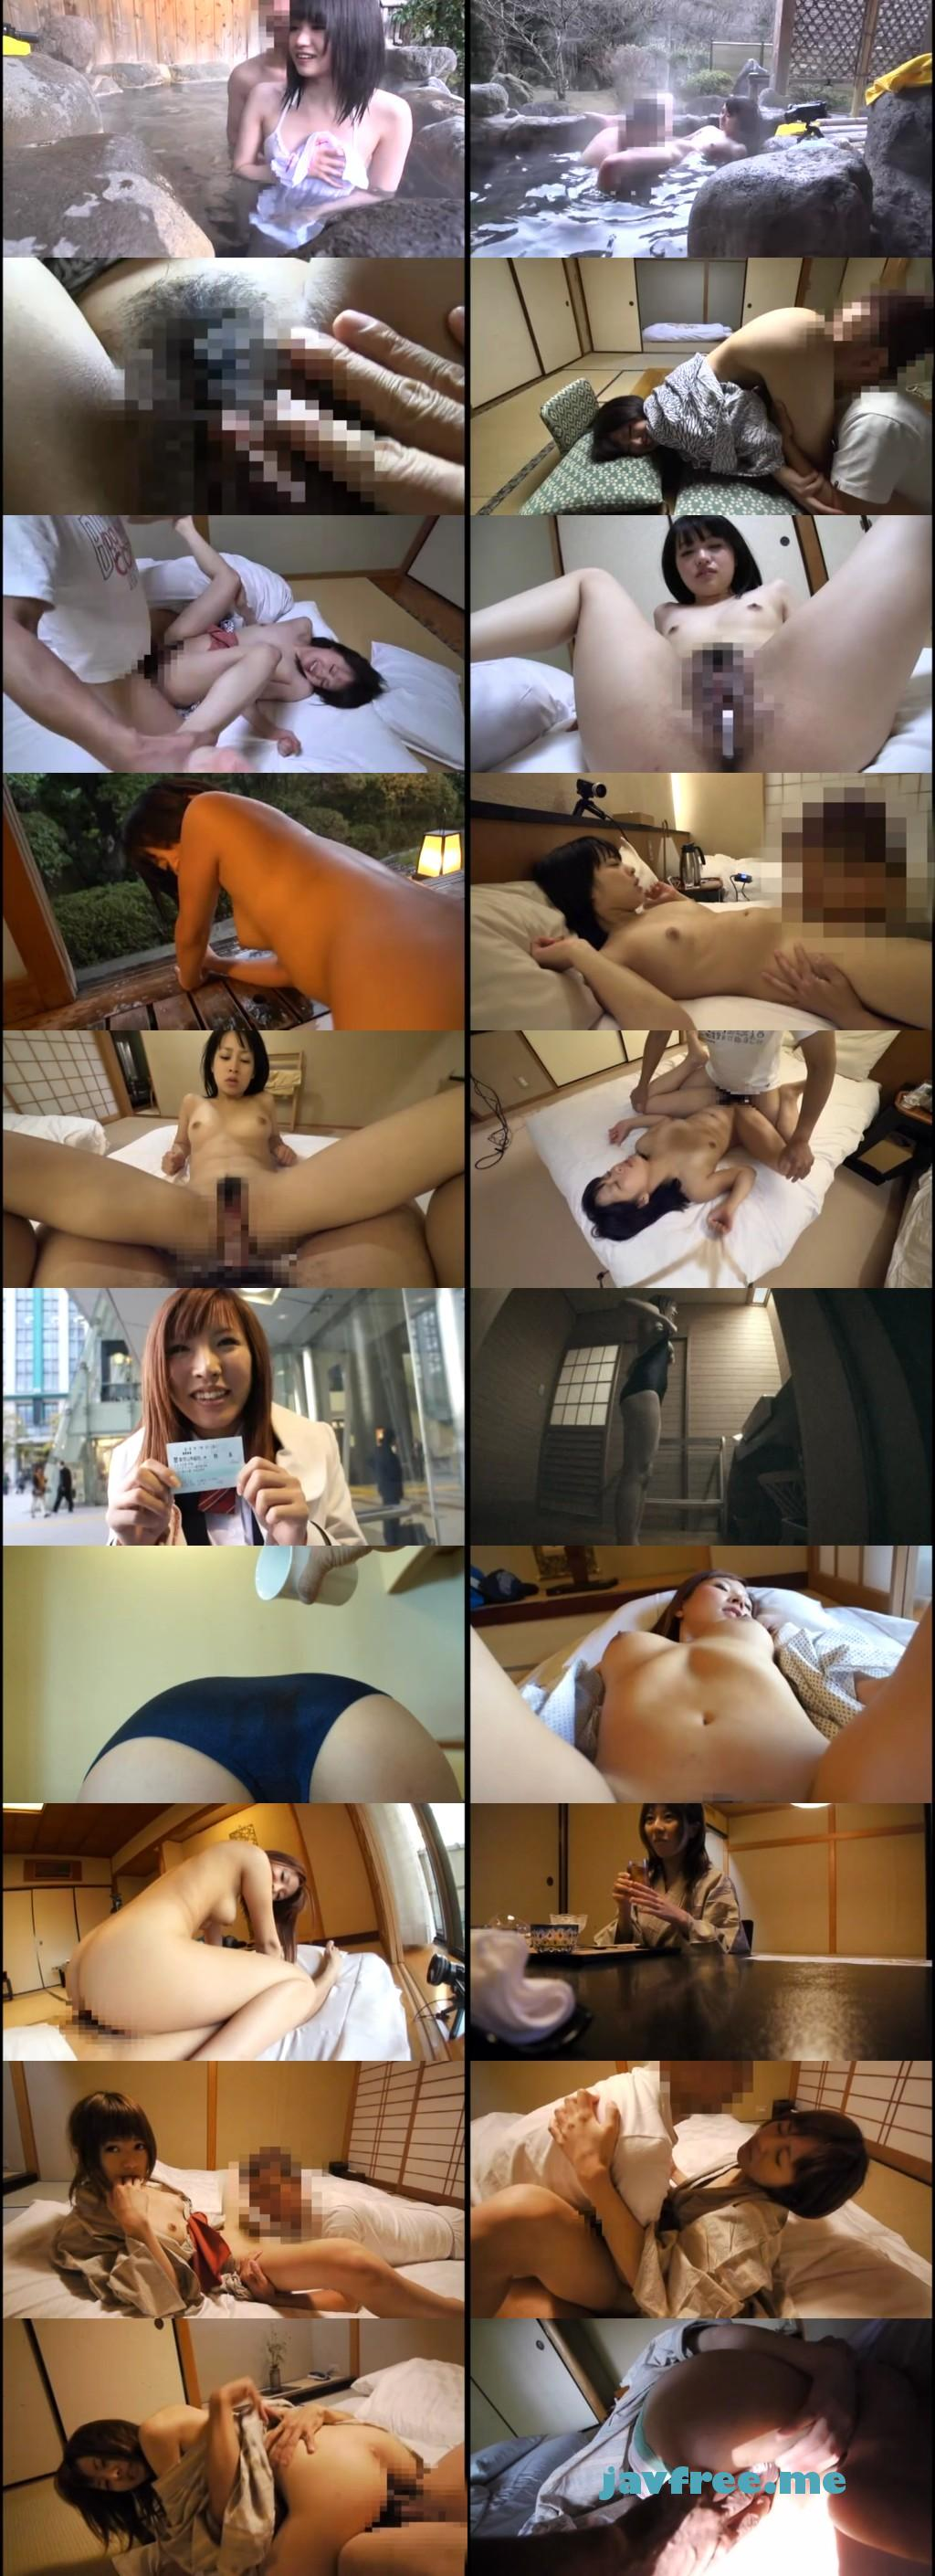 [YKL-005] 美少女1泊2日中出し温泉旅行 05 - image ykl-005 on https://javfree.me